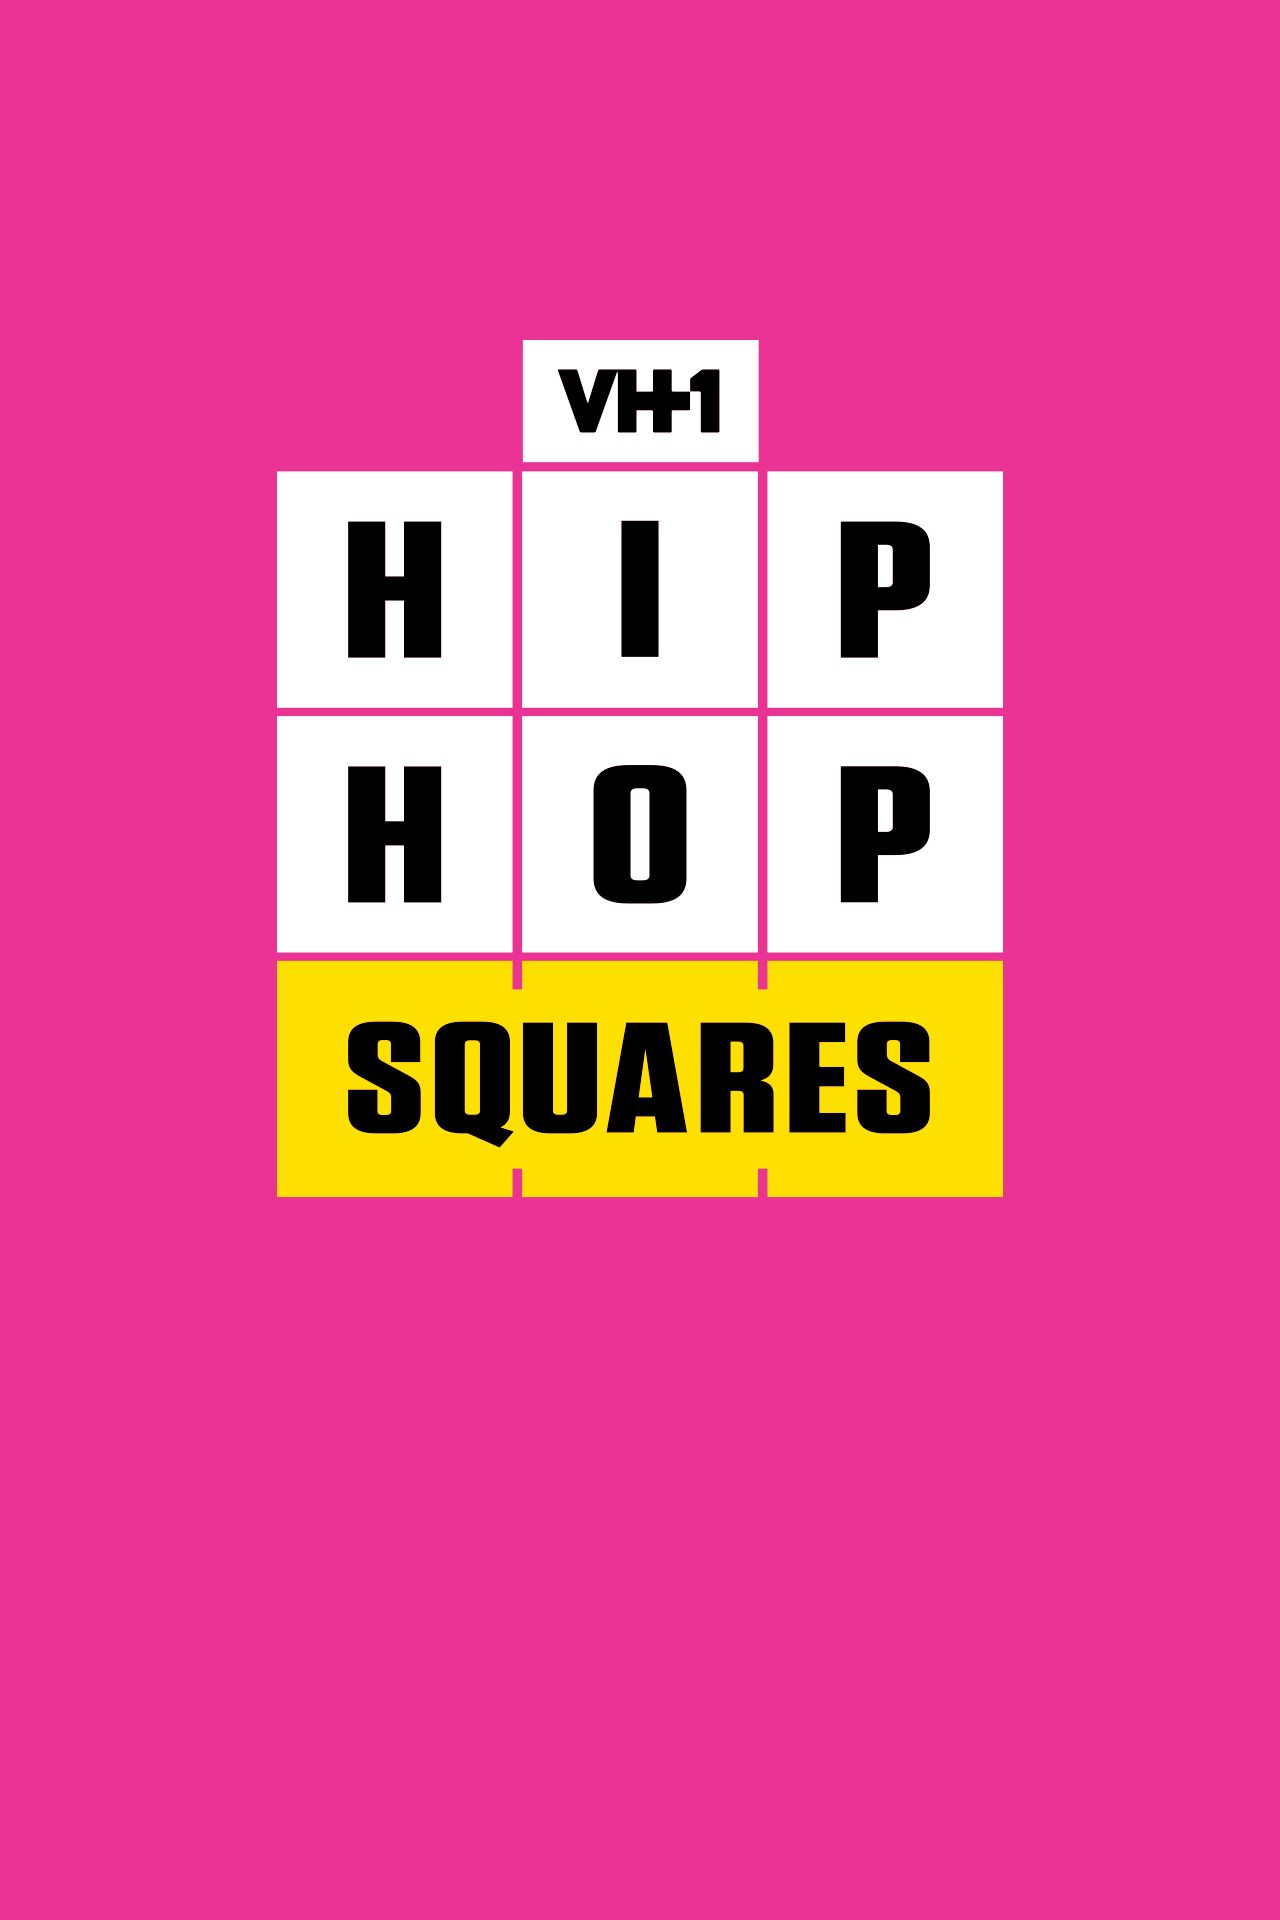 Hip Hop Squares - Watch Full Episodes | VH1